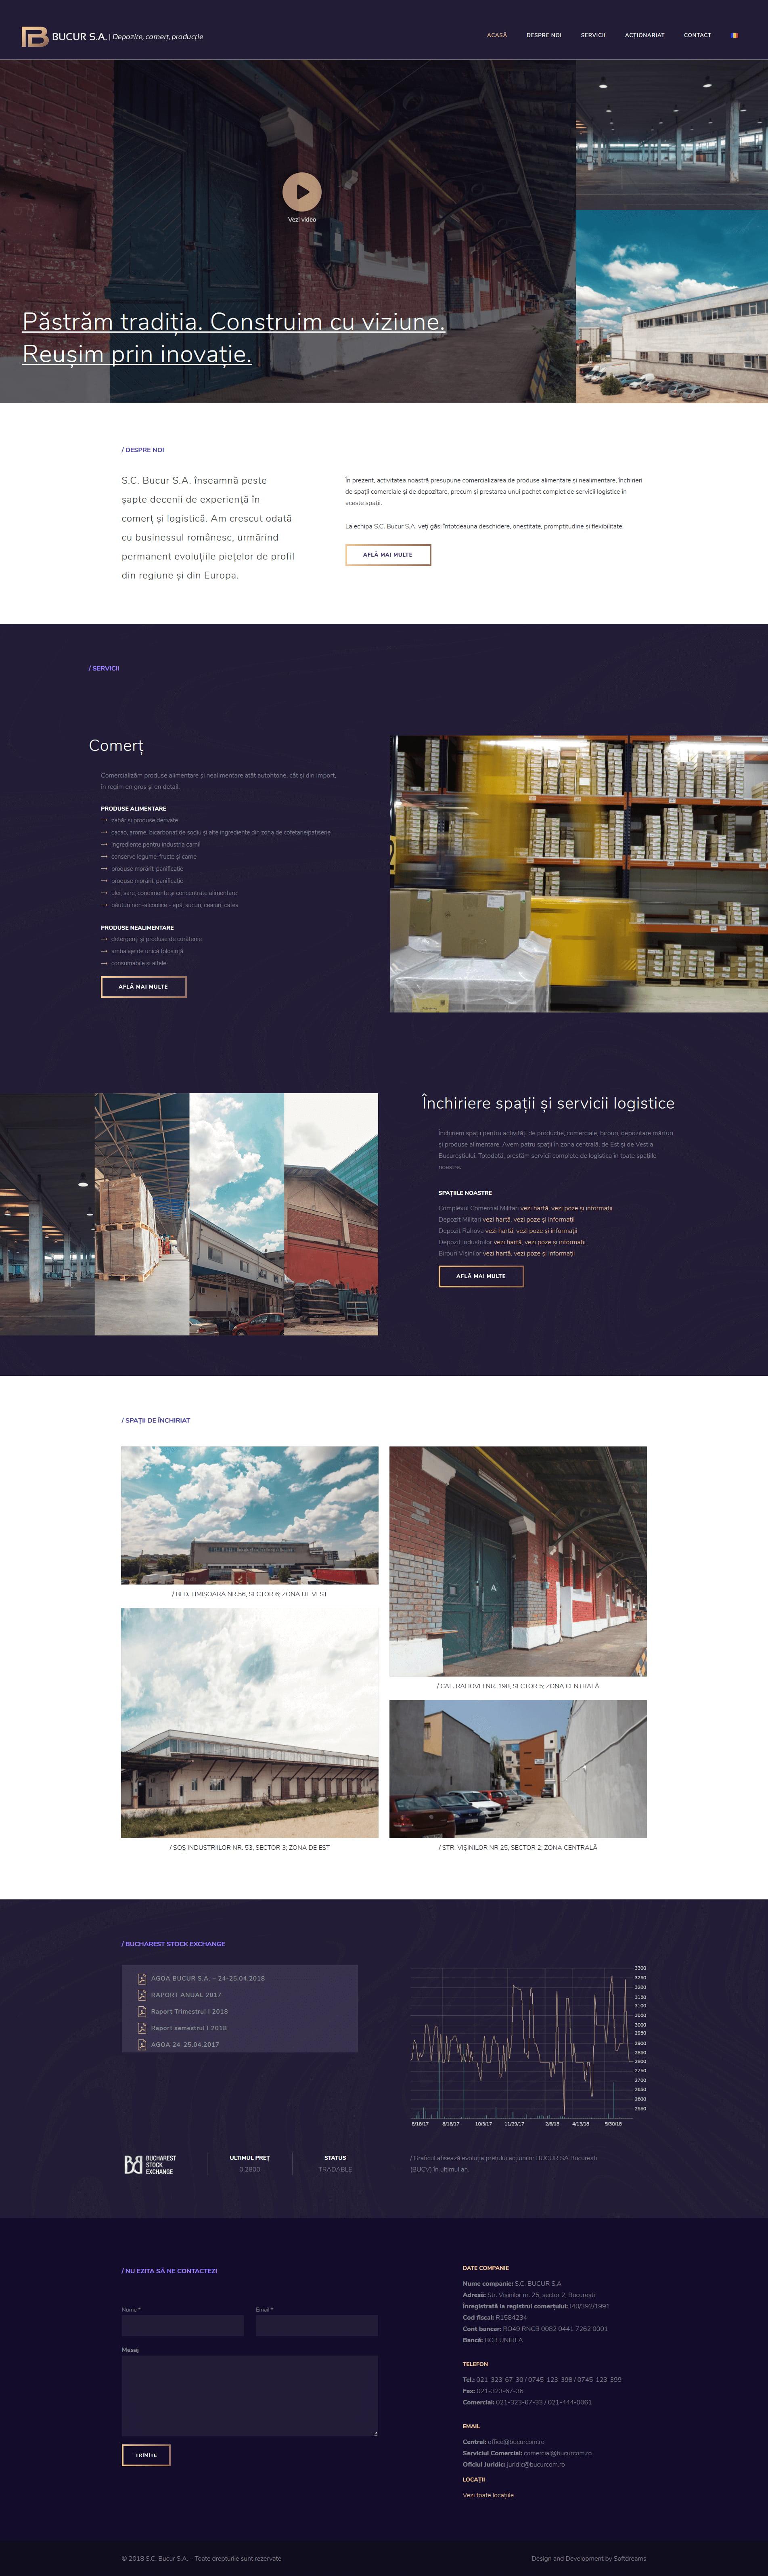 Bucur_-_Depozite_Comert_Productie_-_2018-10-10_14.57.10